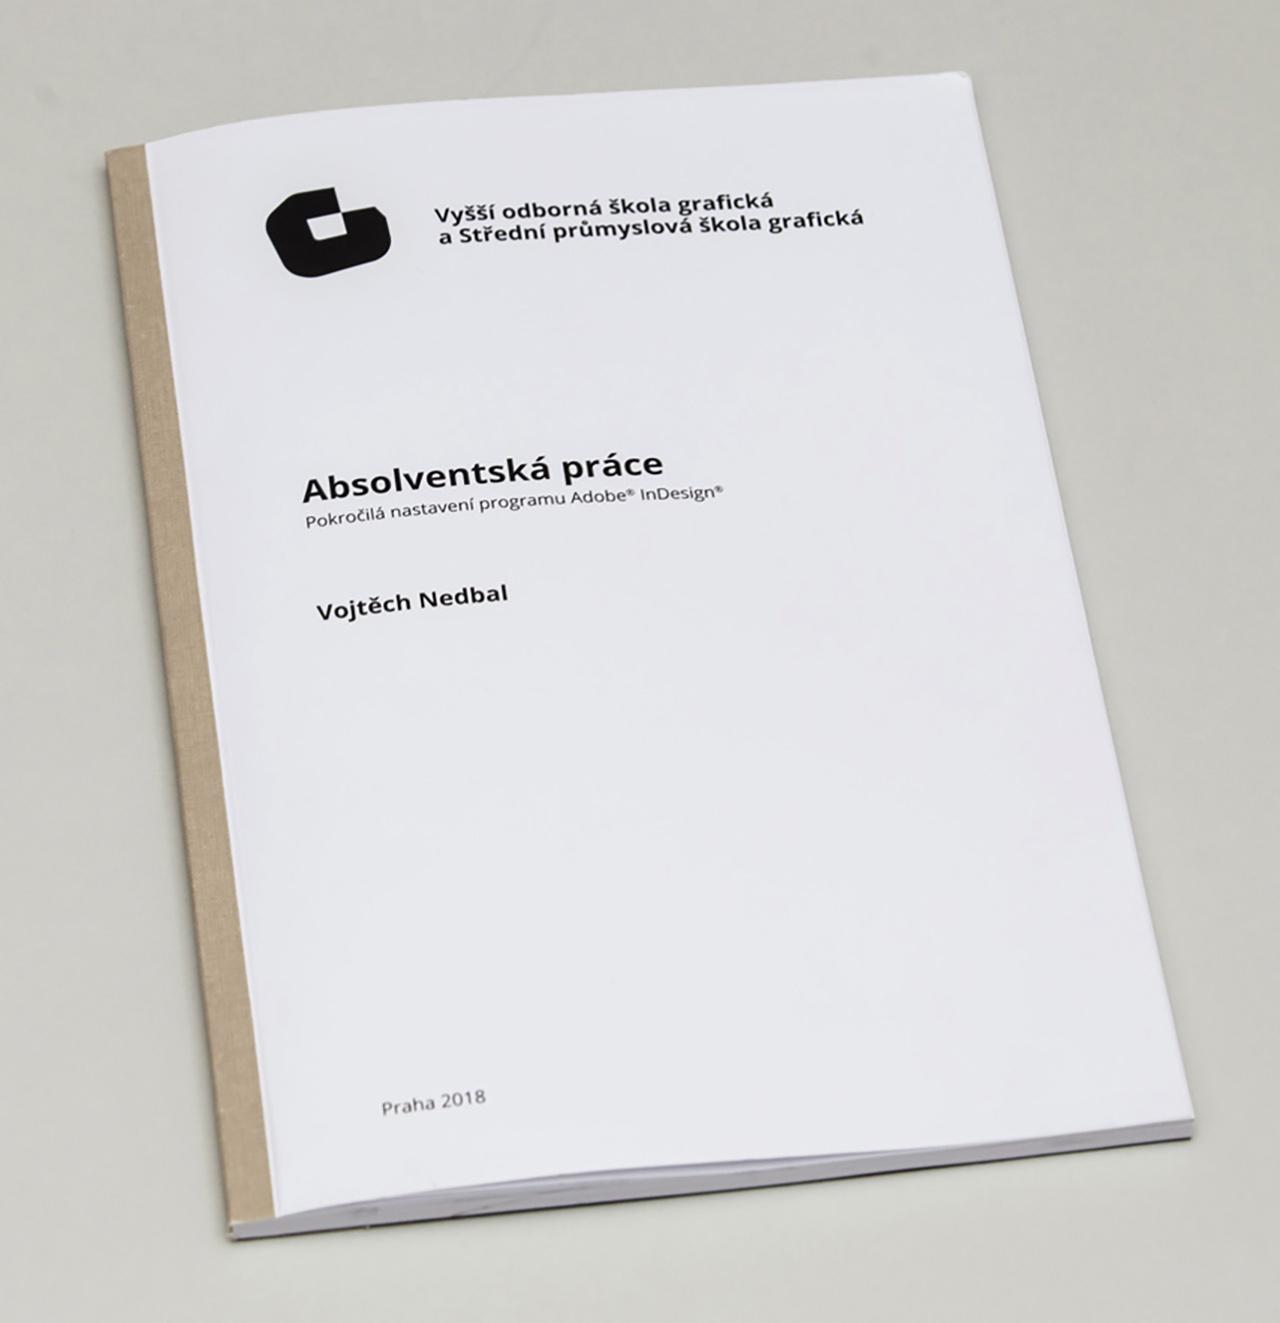 Pokročilá nastavení programu Adobe® InDesign® | G3B04 | 2018